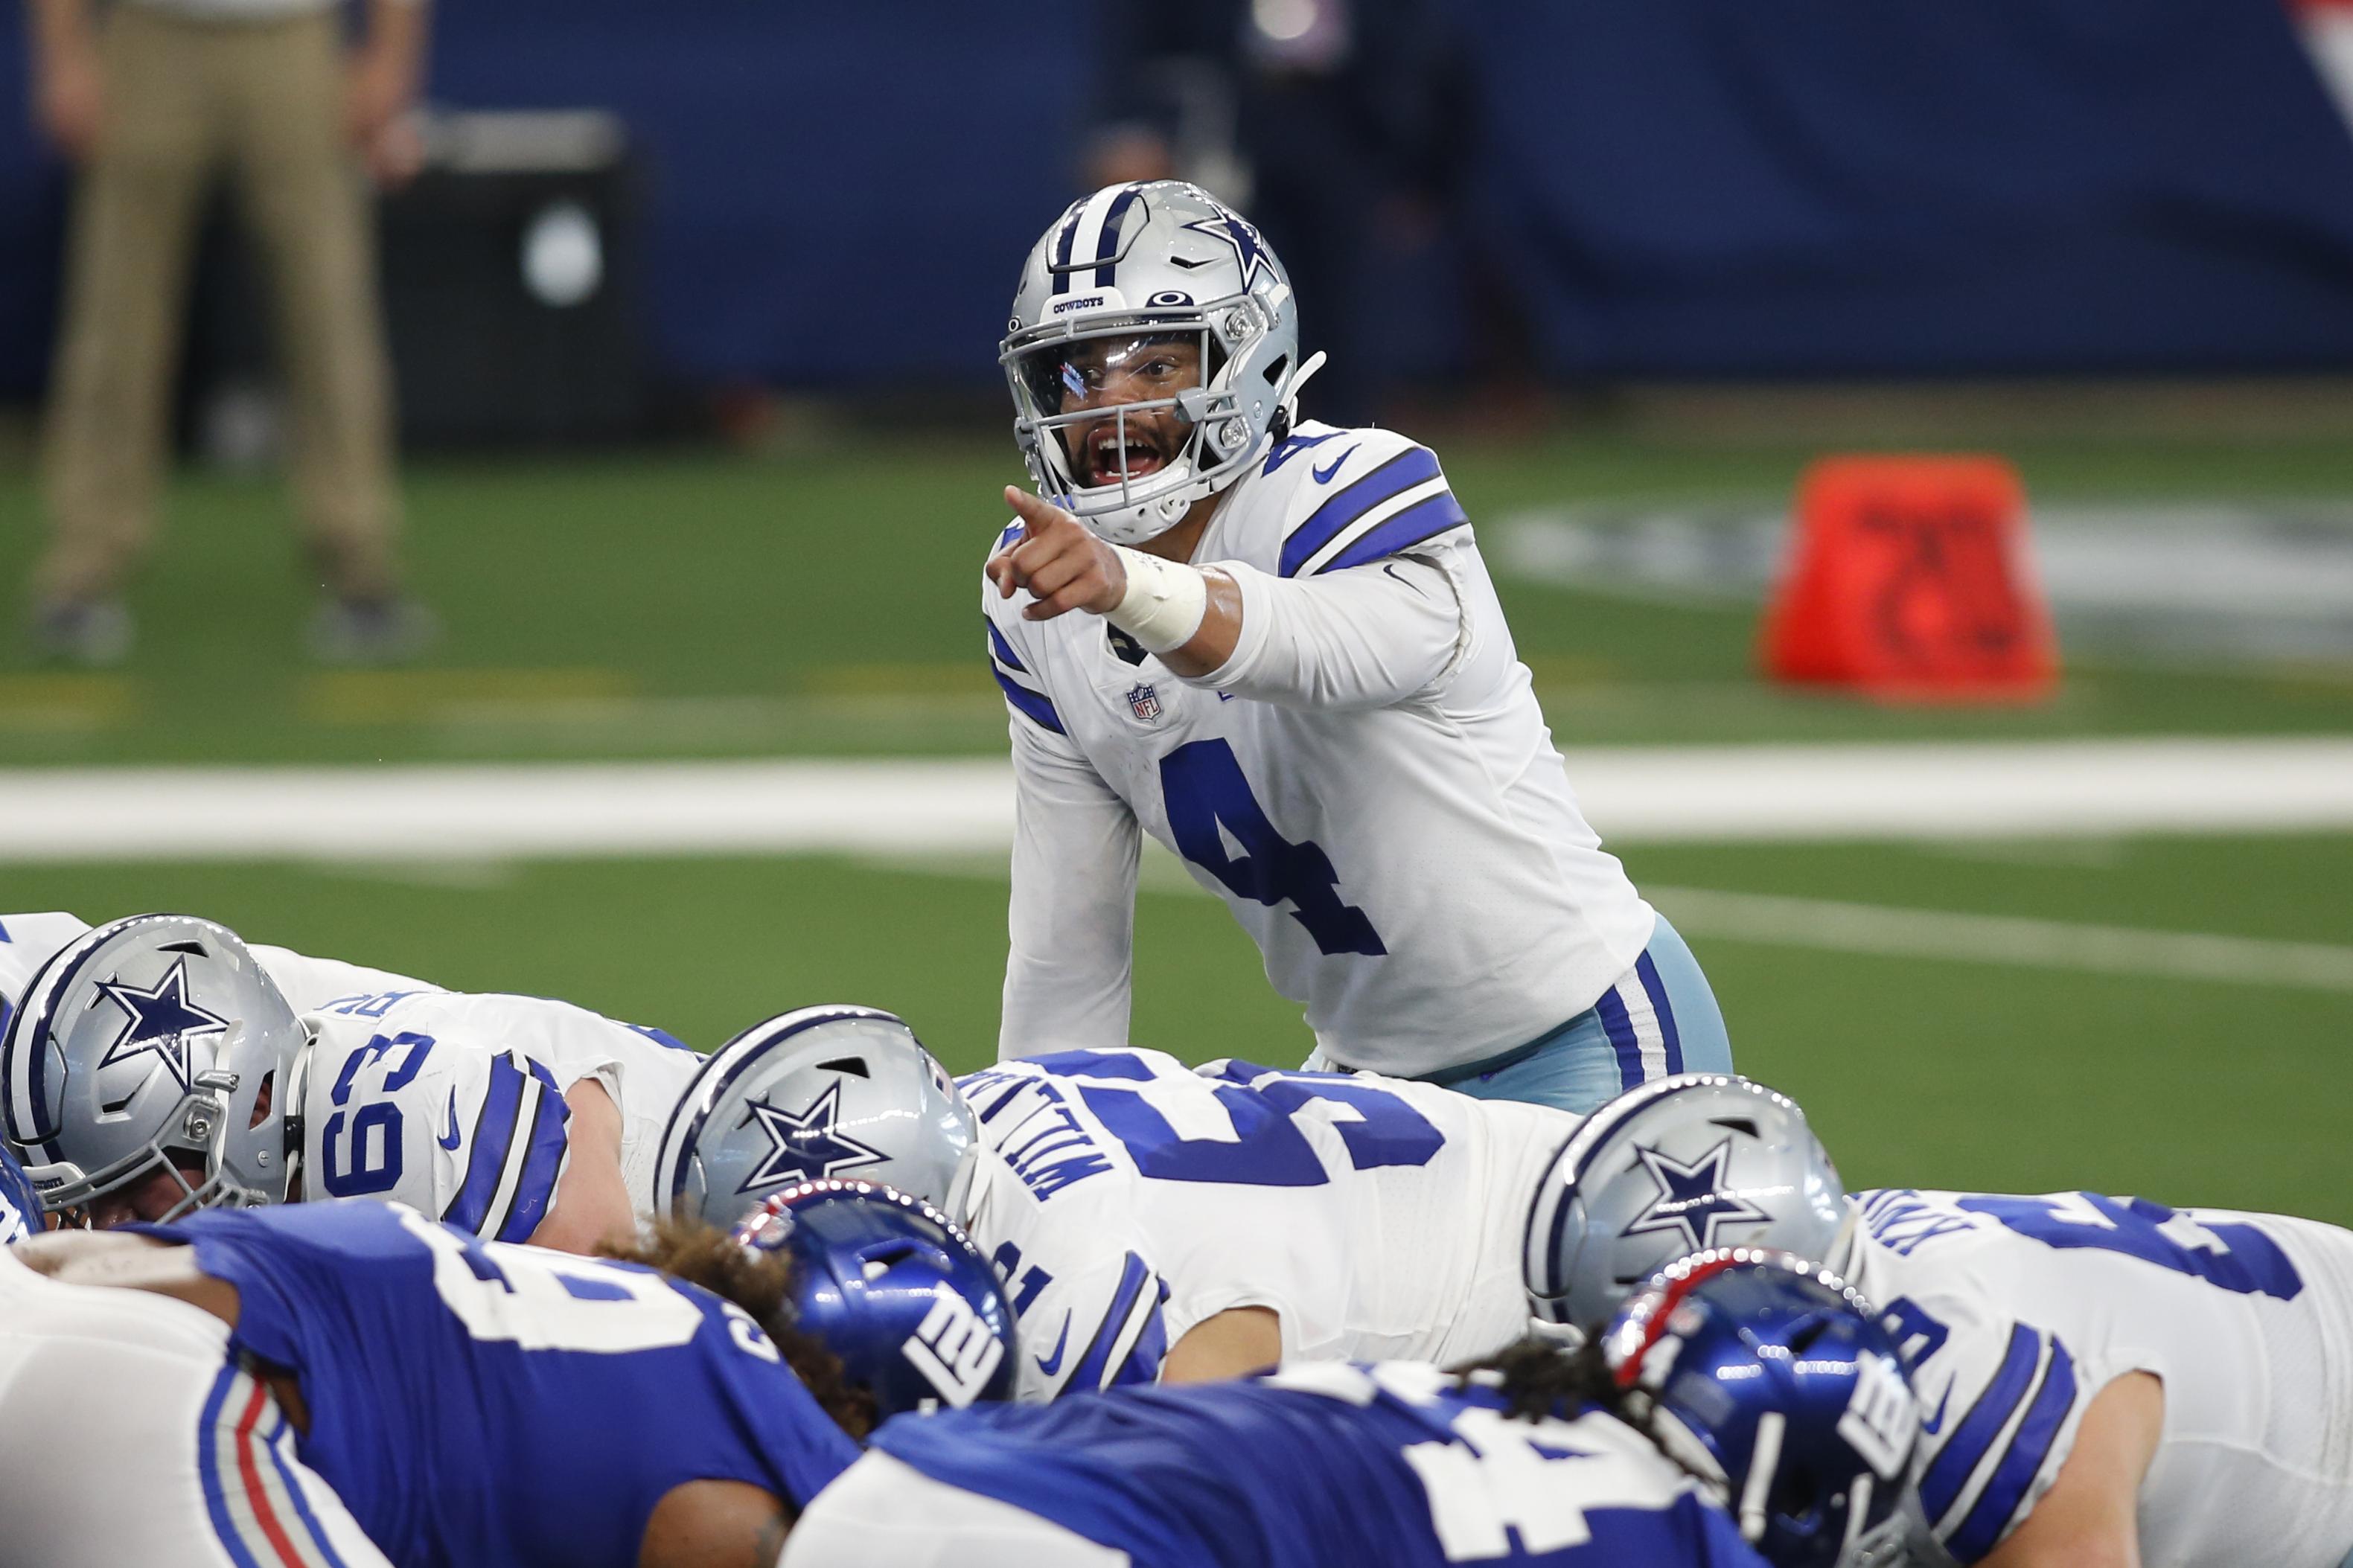 Dallas Cowboys quarterback Dak Prescott (4) calls a play in the second quarter against the New York Giants at AT&T Stadium.